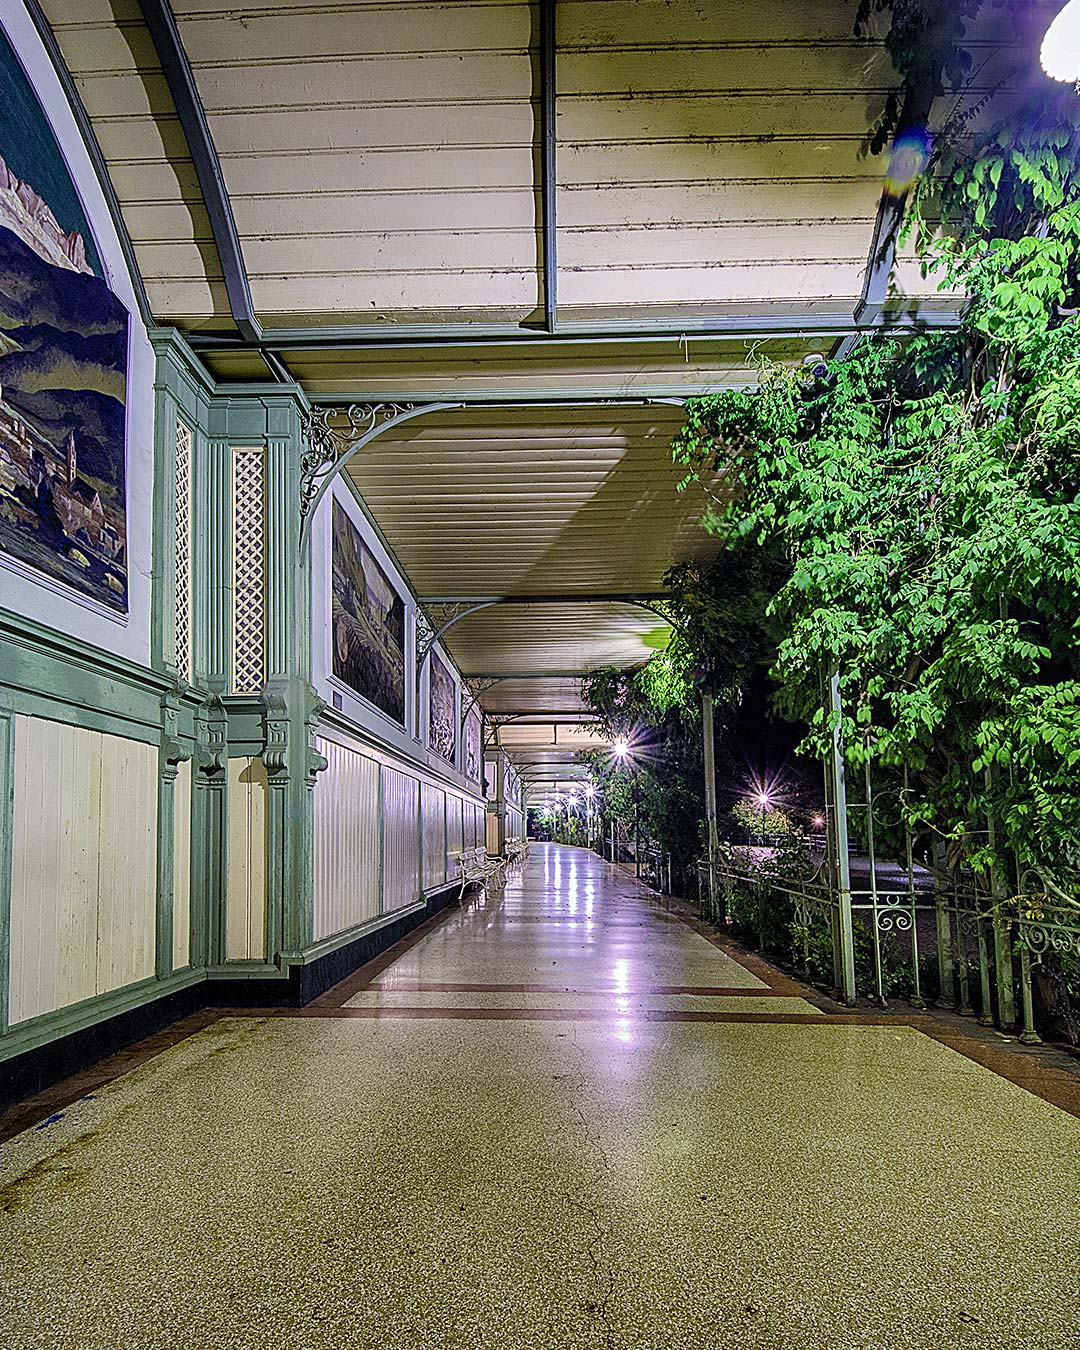 Wandelhalle di notte